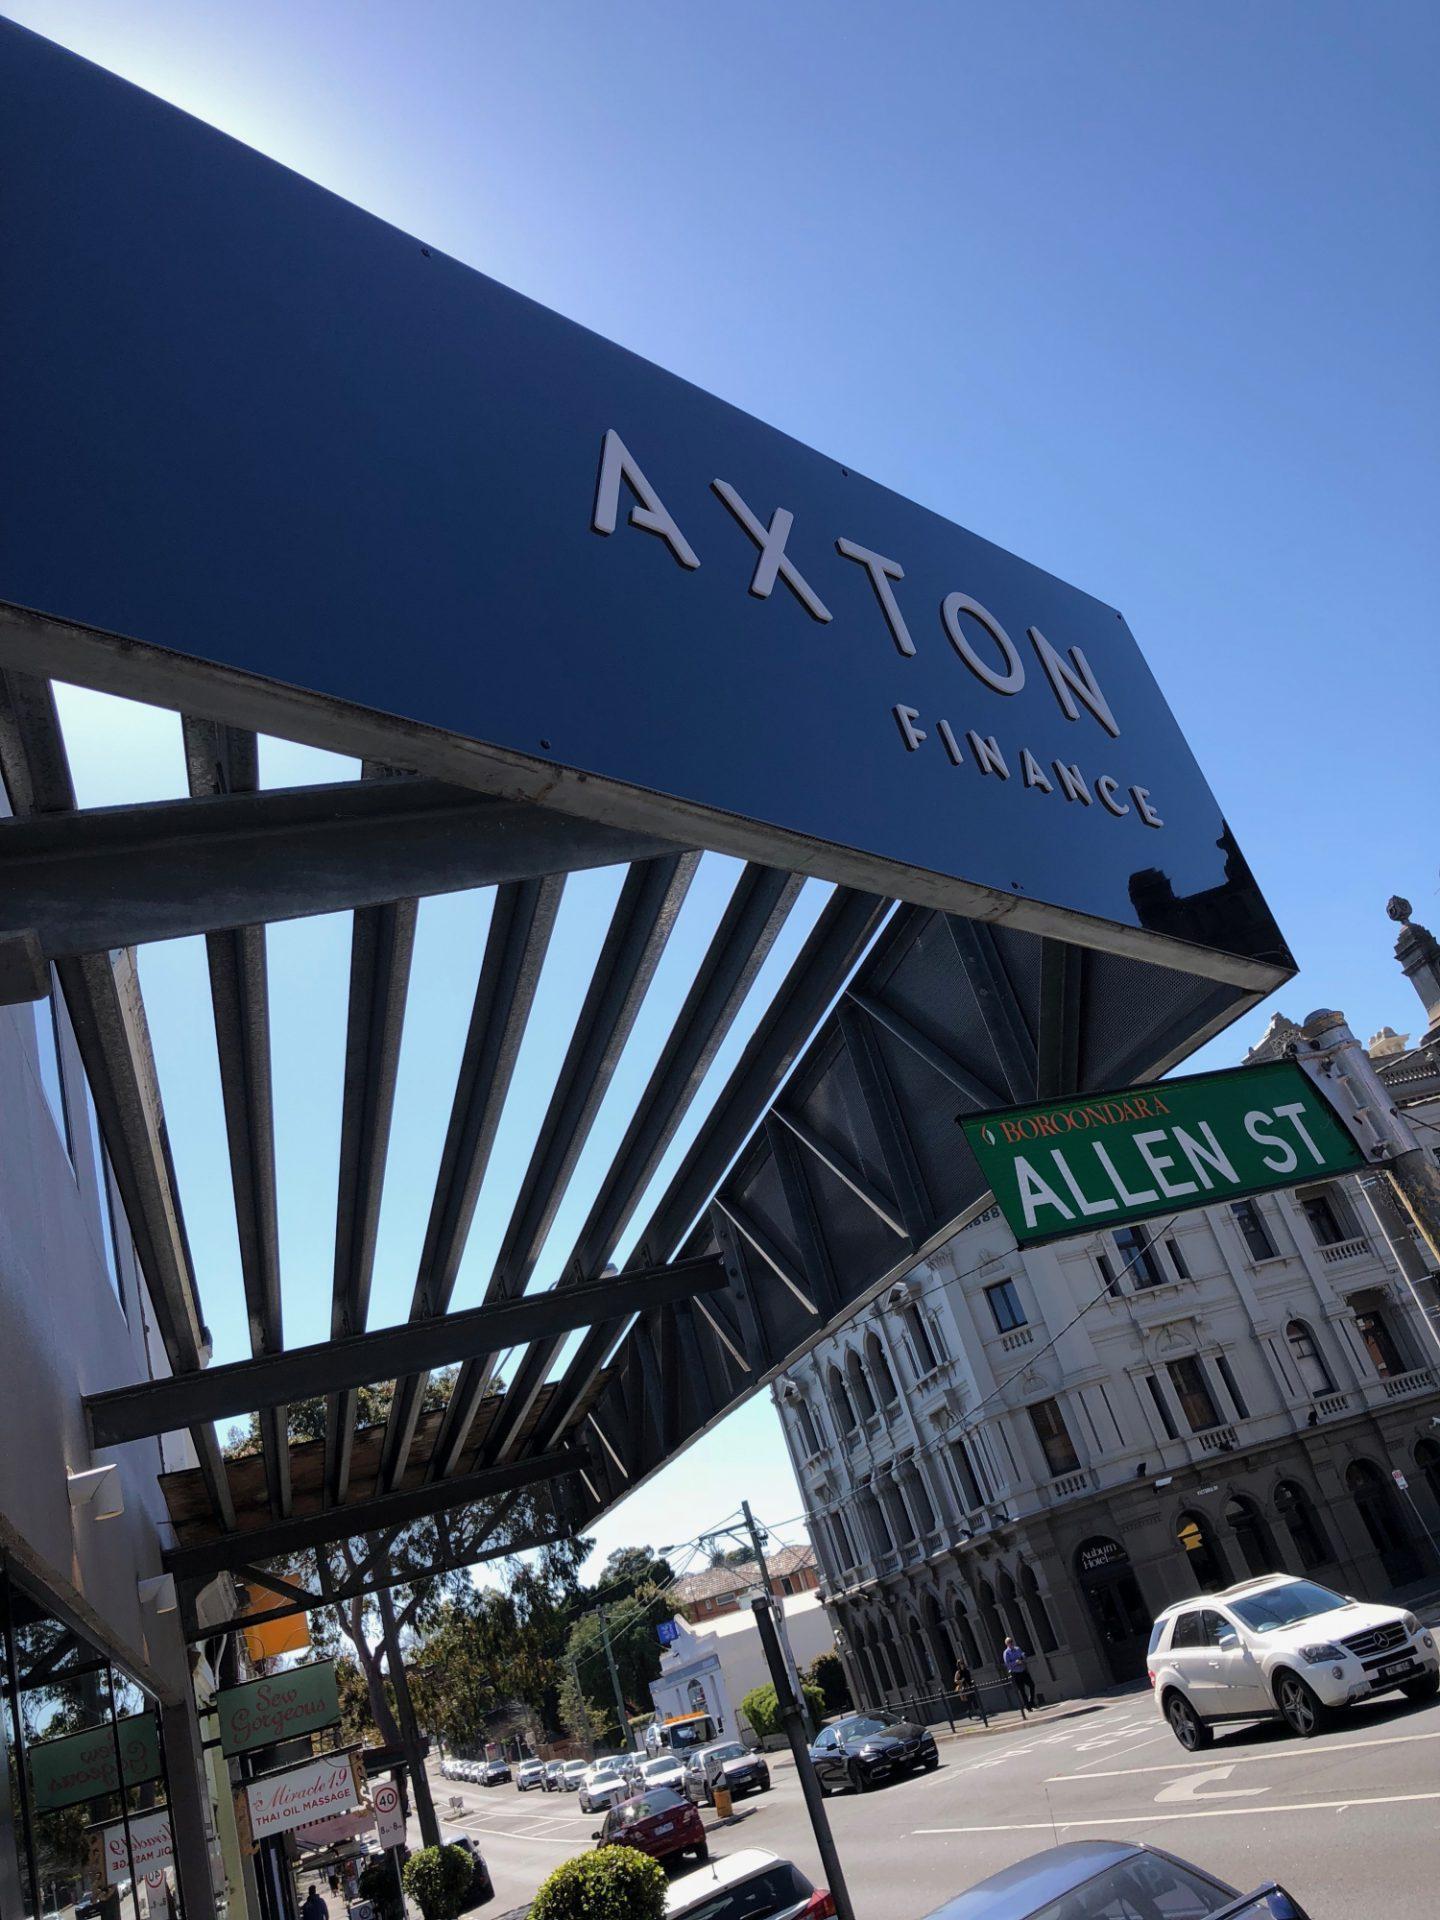 Axton Office External